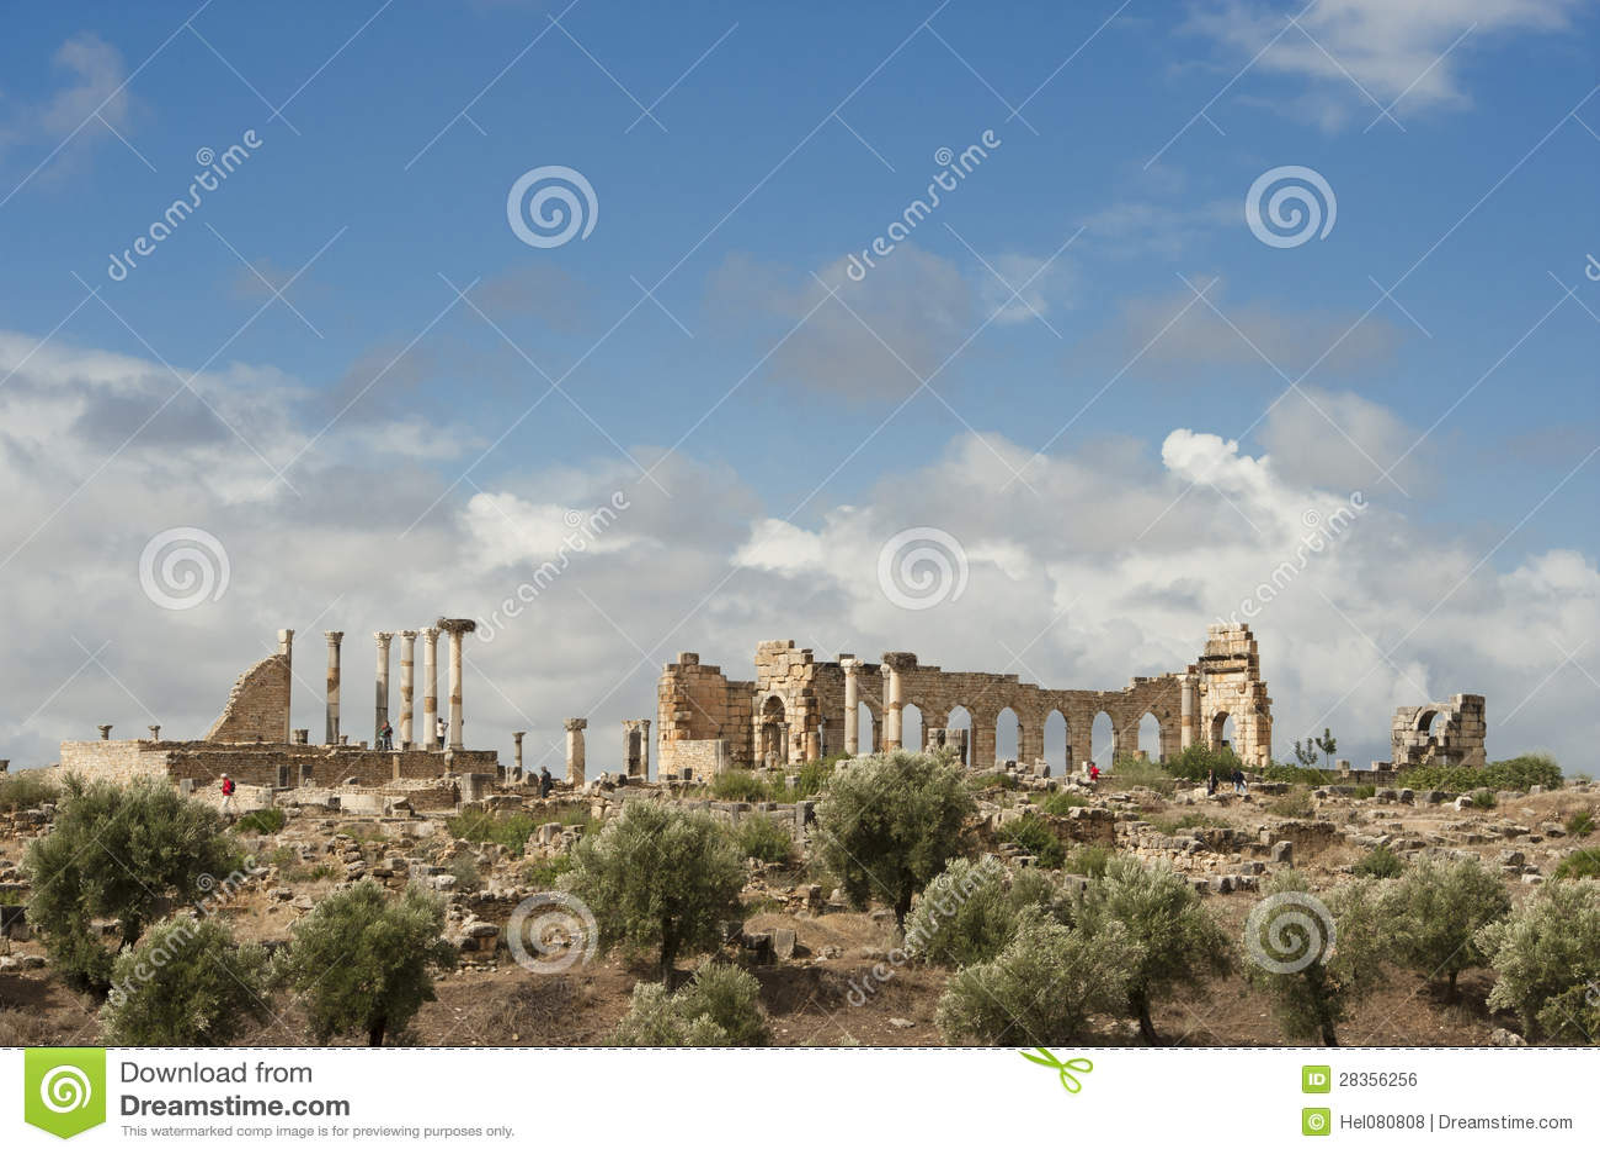 Ruiny rzymski miasto Volubilis w Marocco